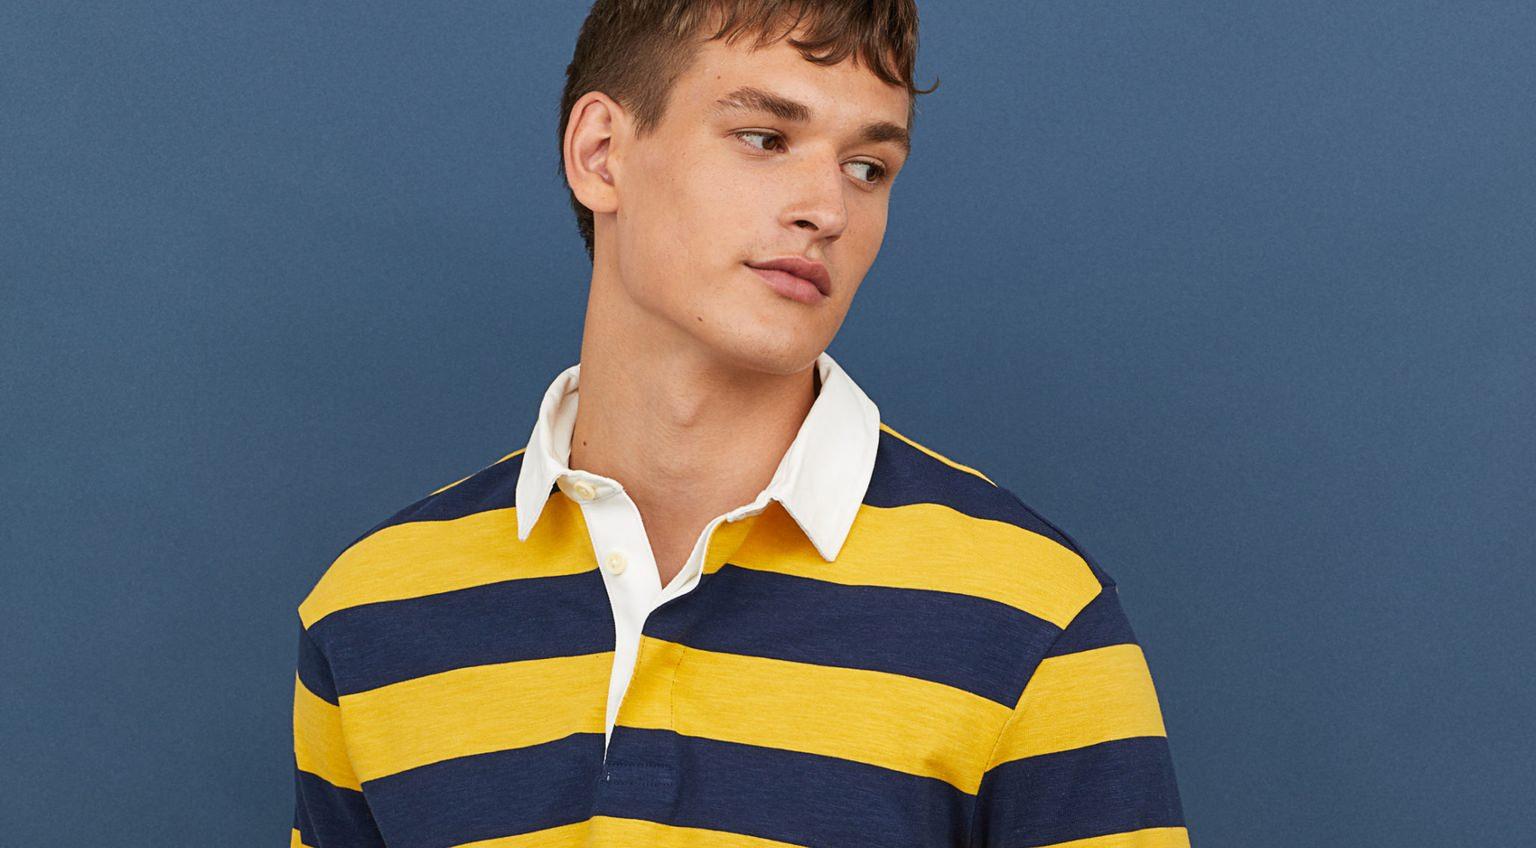 093ef84e8de The Best Men's Rugby Shirts - '90s Trend | Valet.